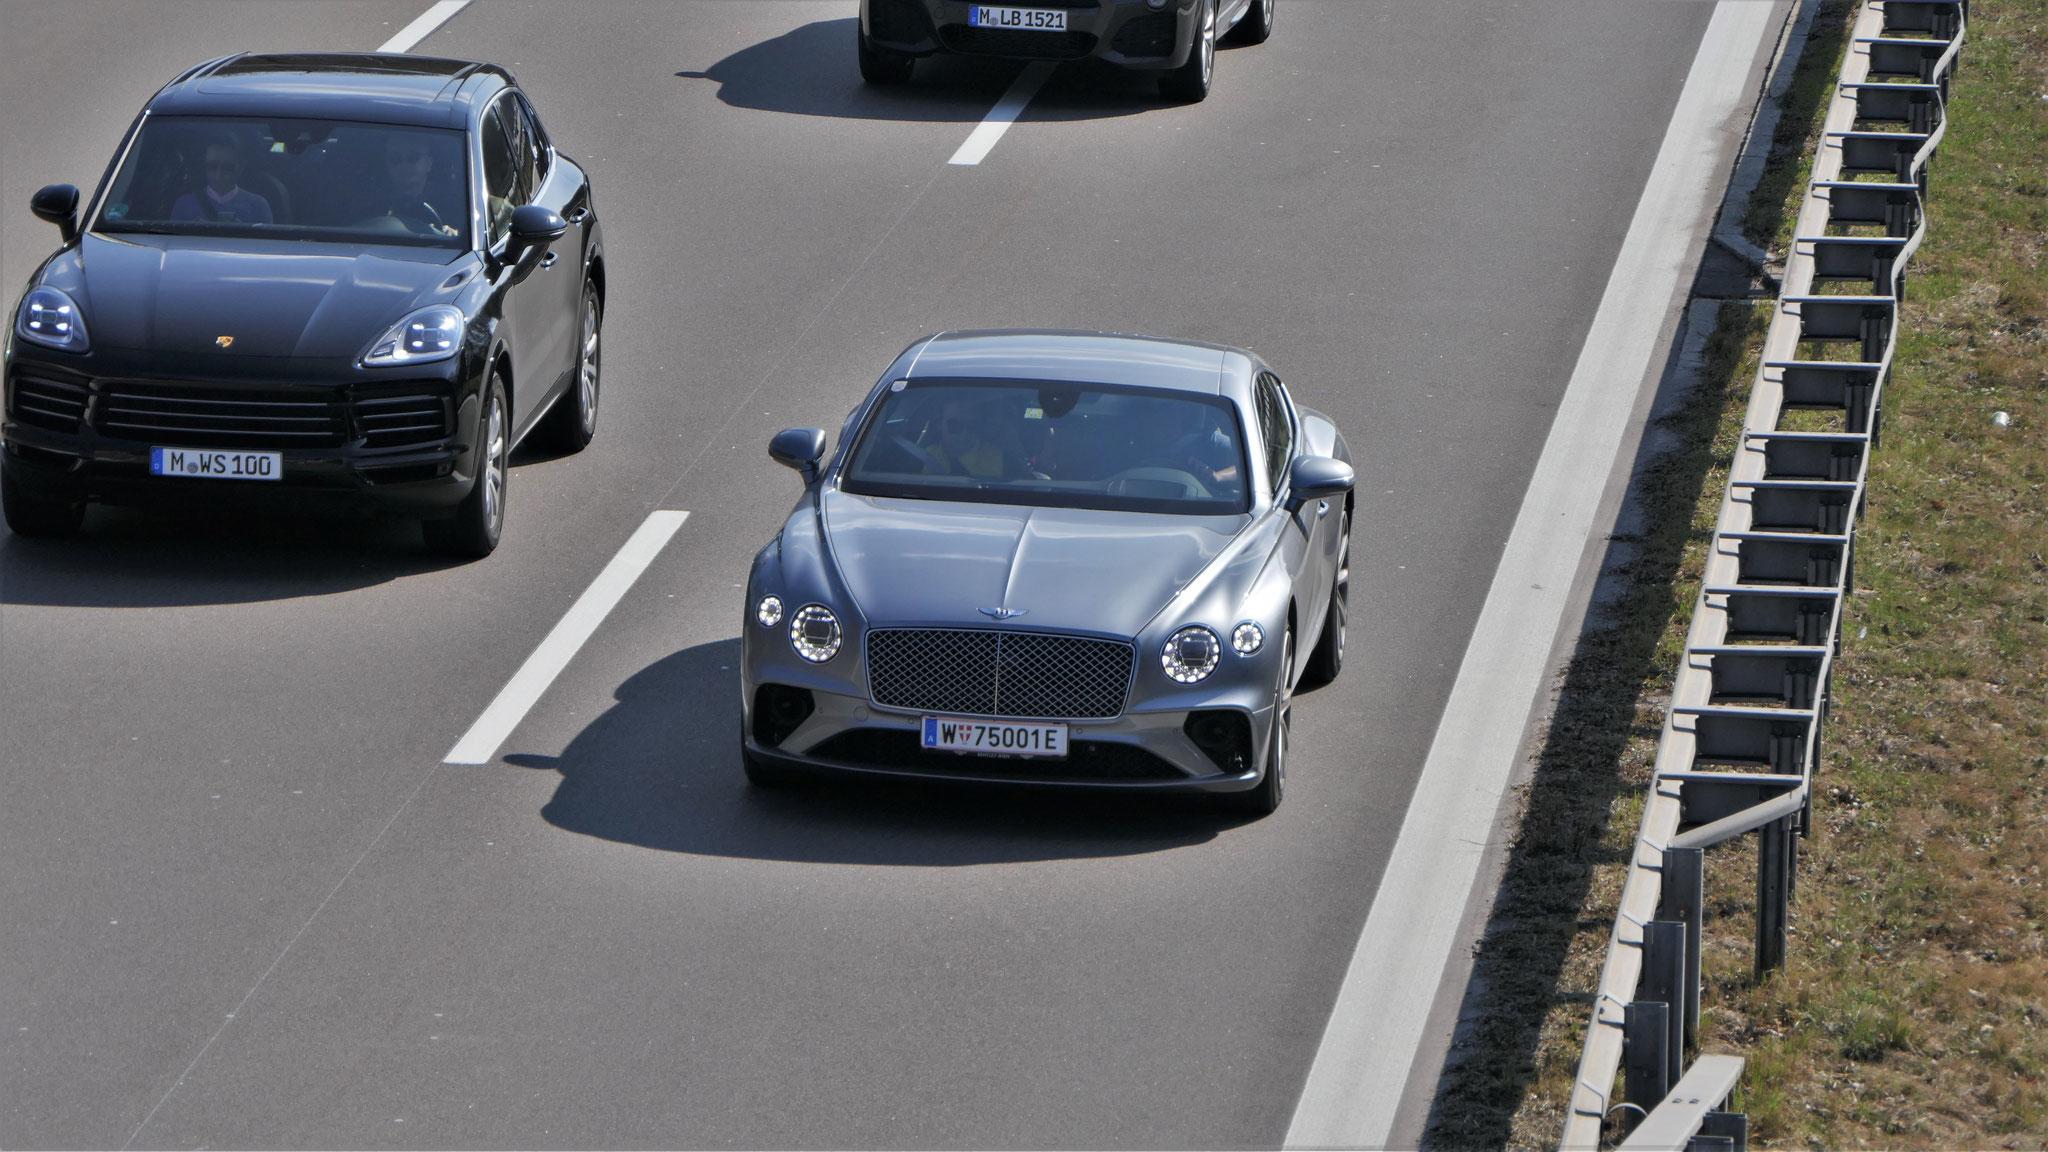 Bentley Continental GT - W-75001-E (AUT)